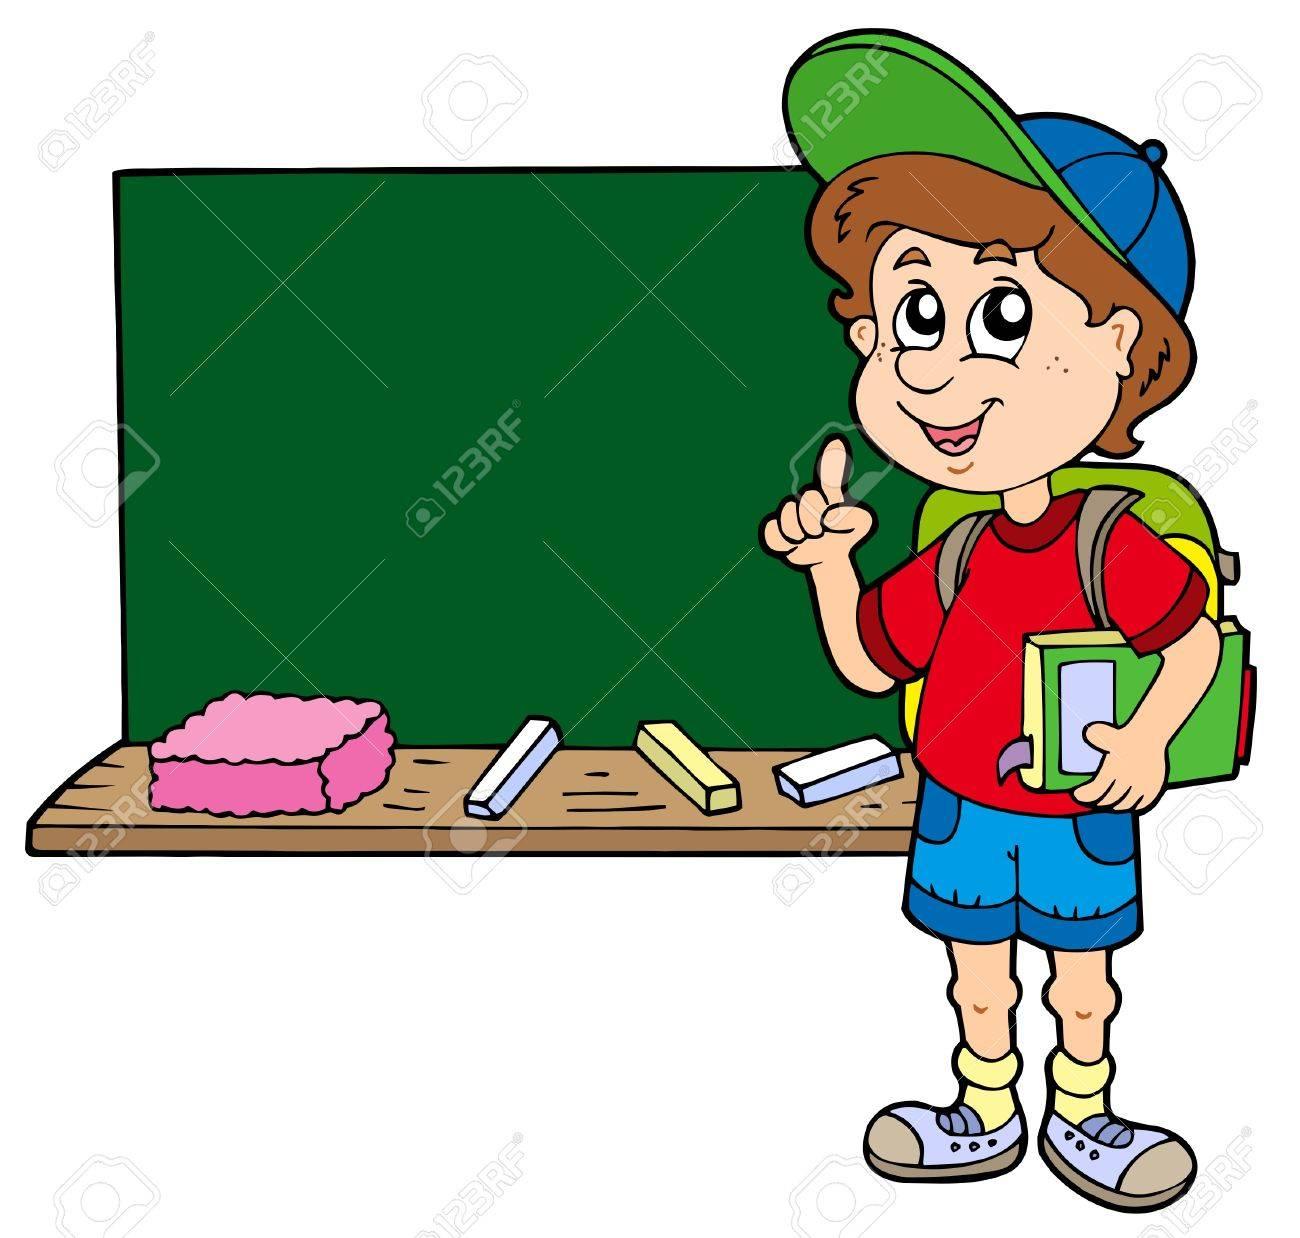 Advising school boy with blackboard Stock Vector - 6579476